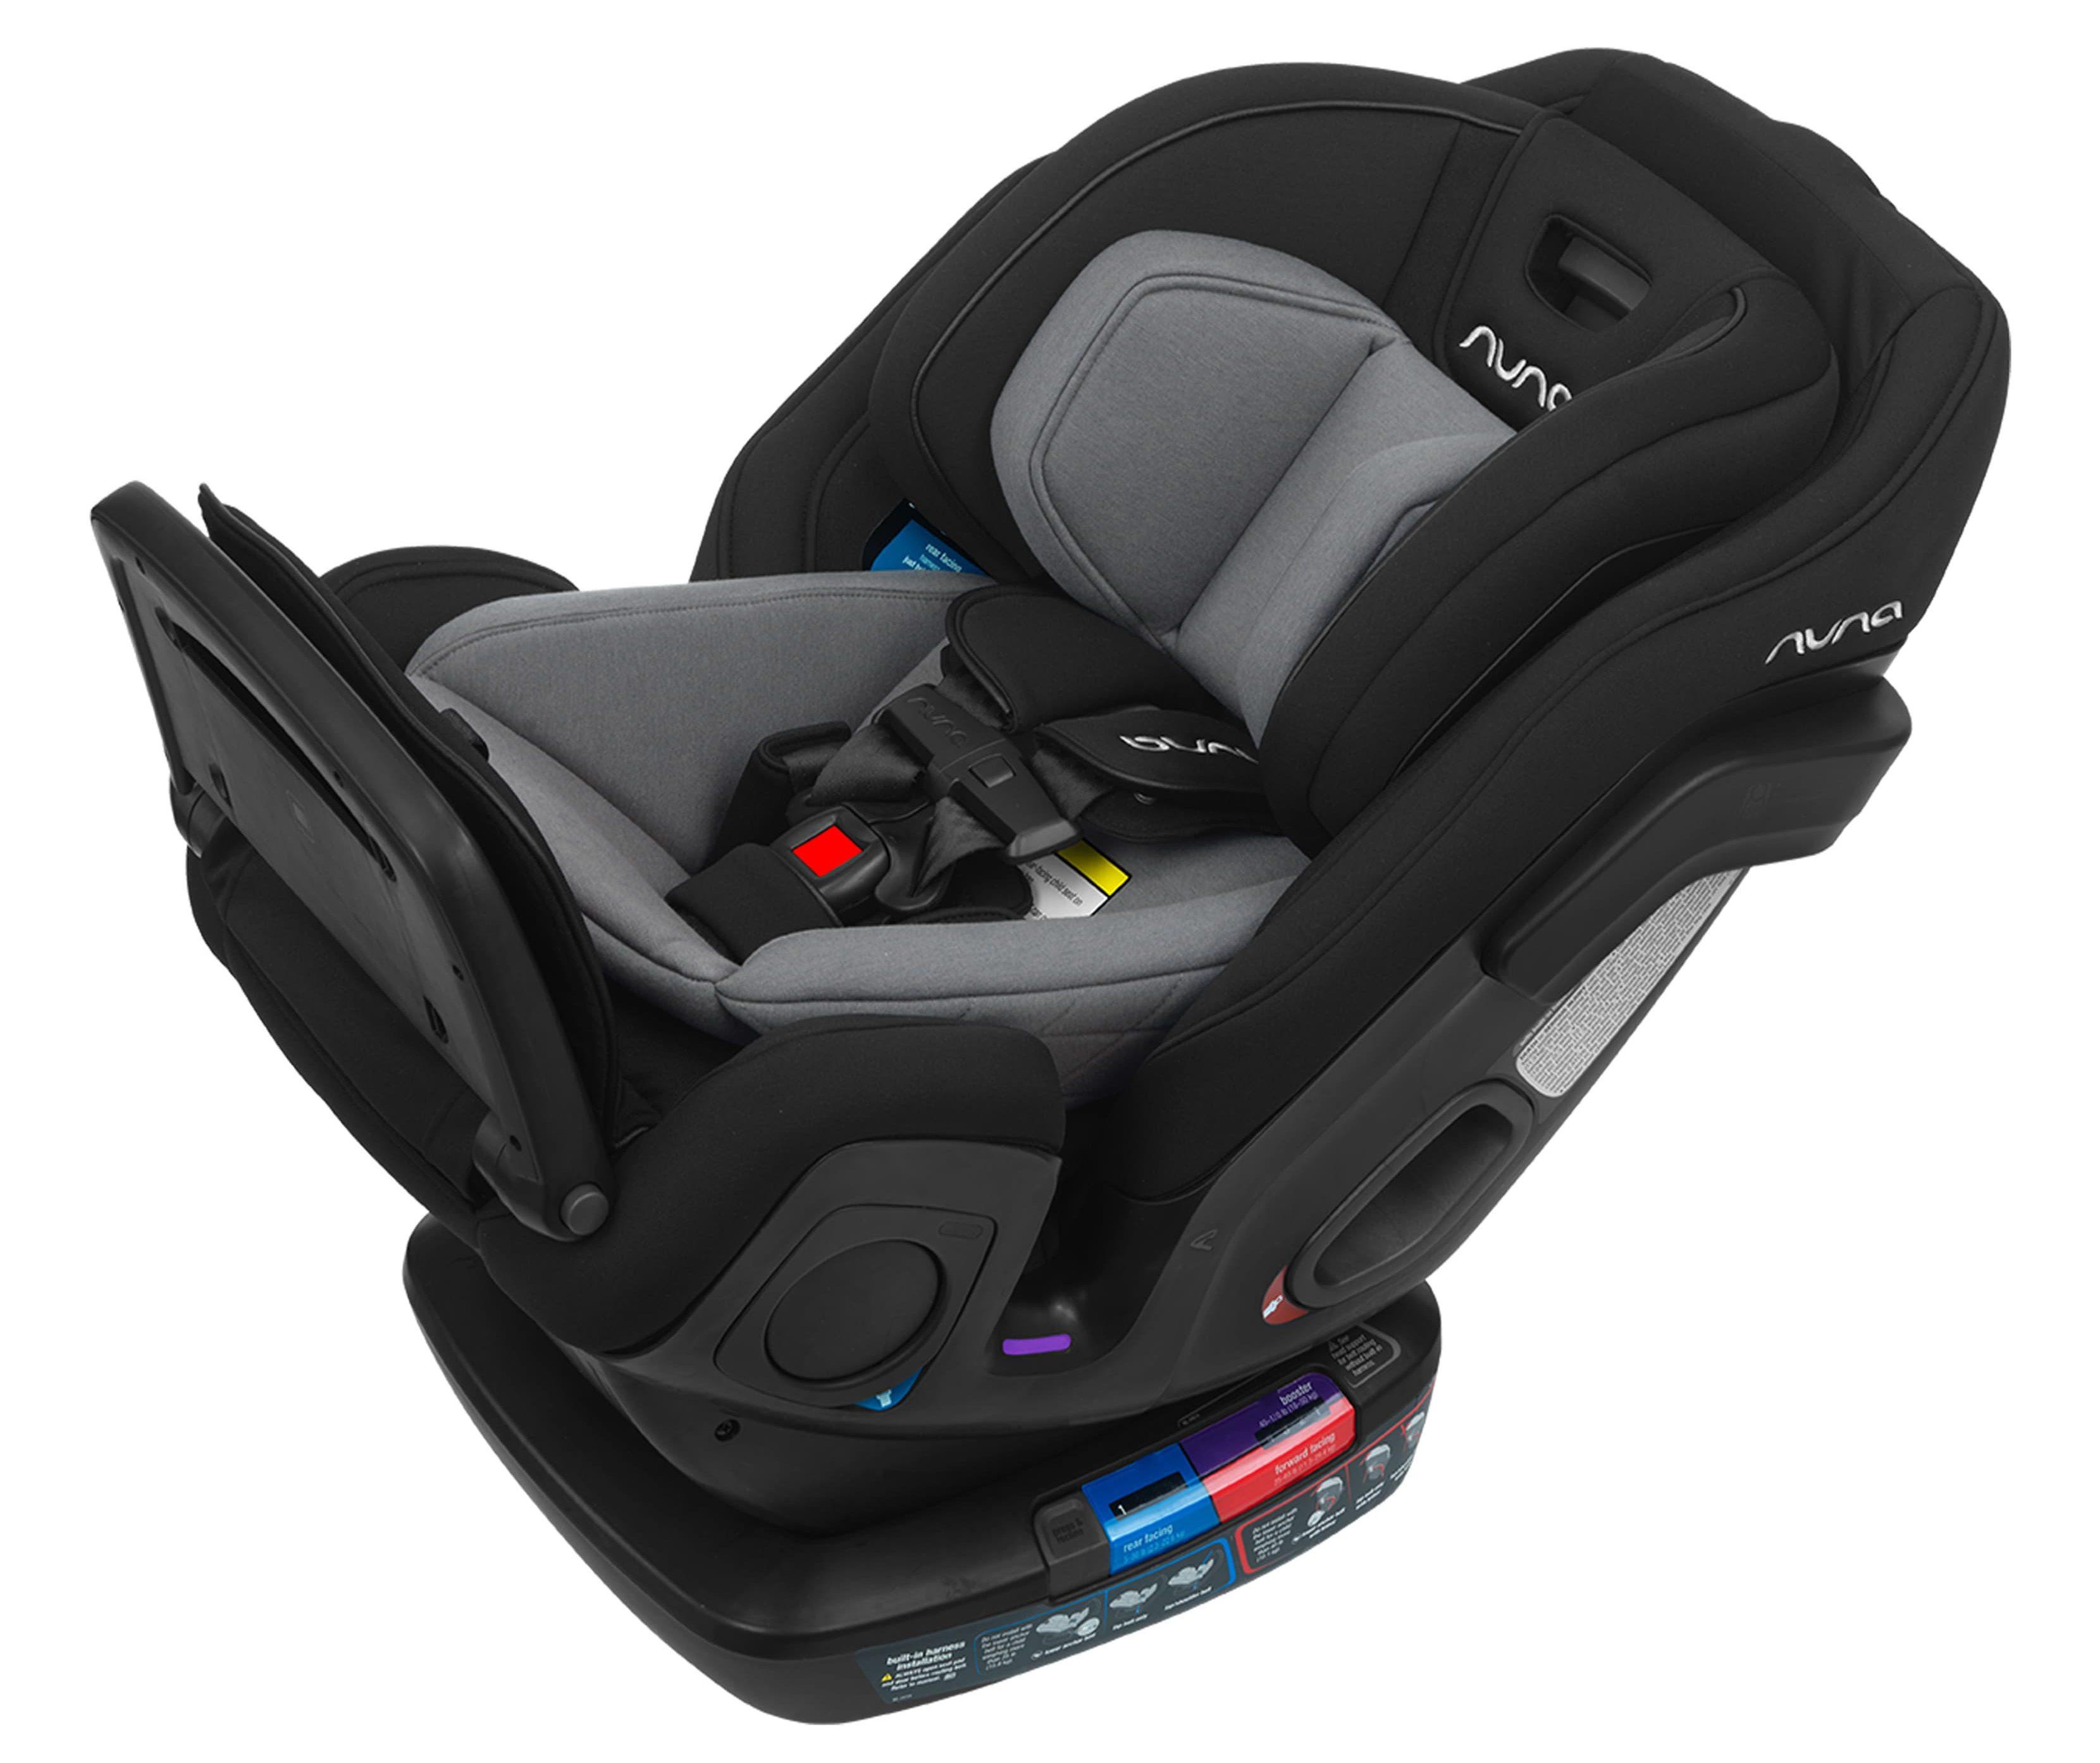 Nuna Exec Convertible Car Seat with Merino Wool Infant Insert